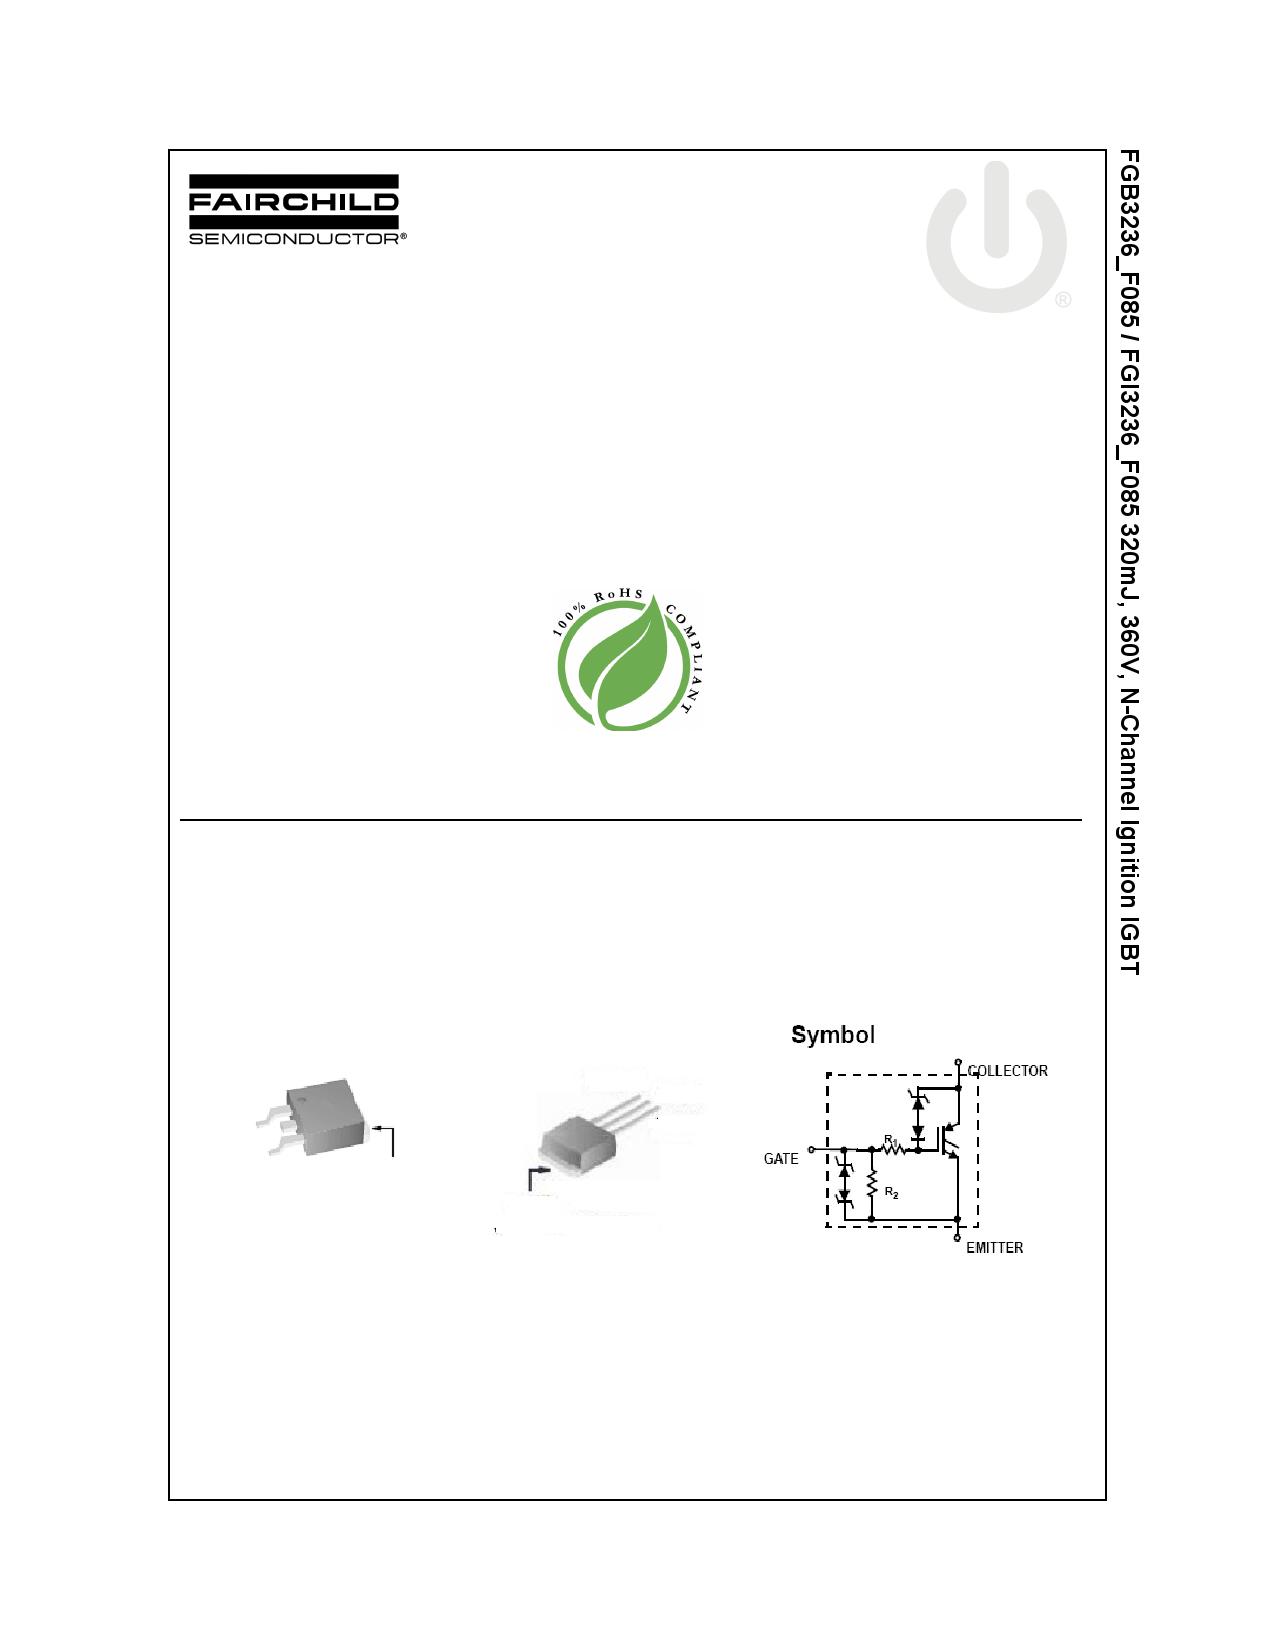 FGI3236_F085 데이터시트 및 FGI3236_F085 PDF